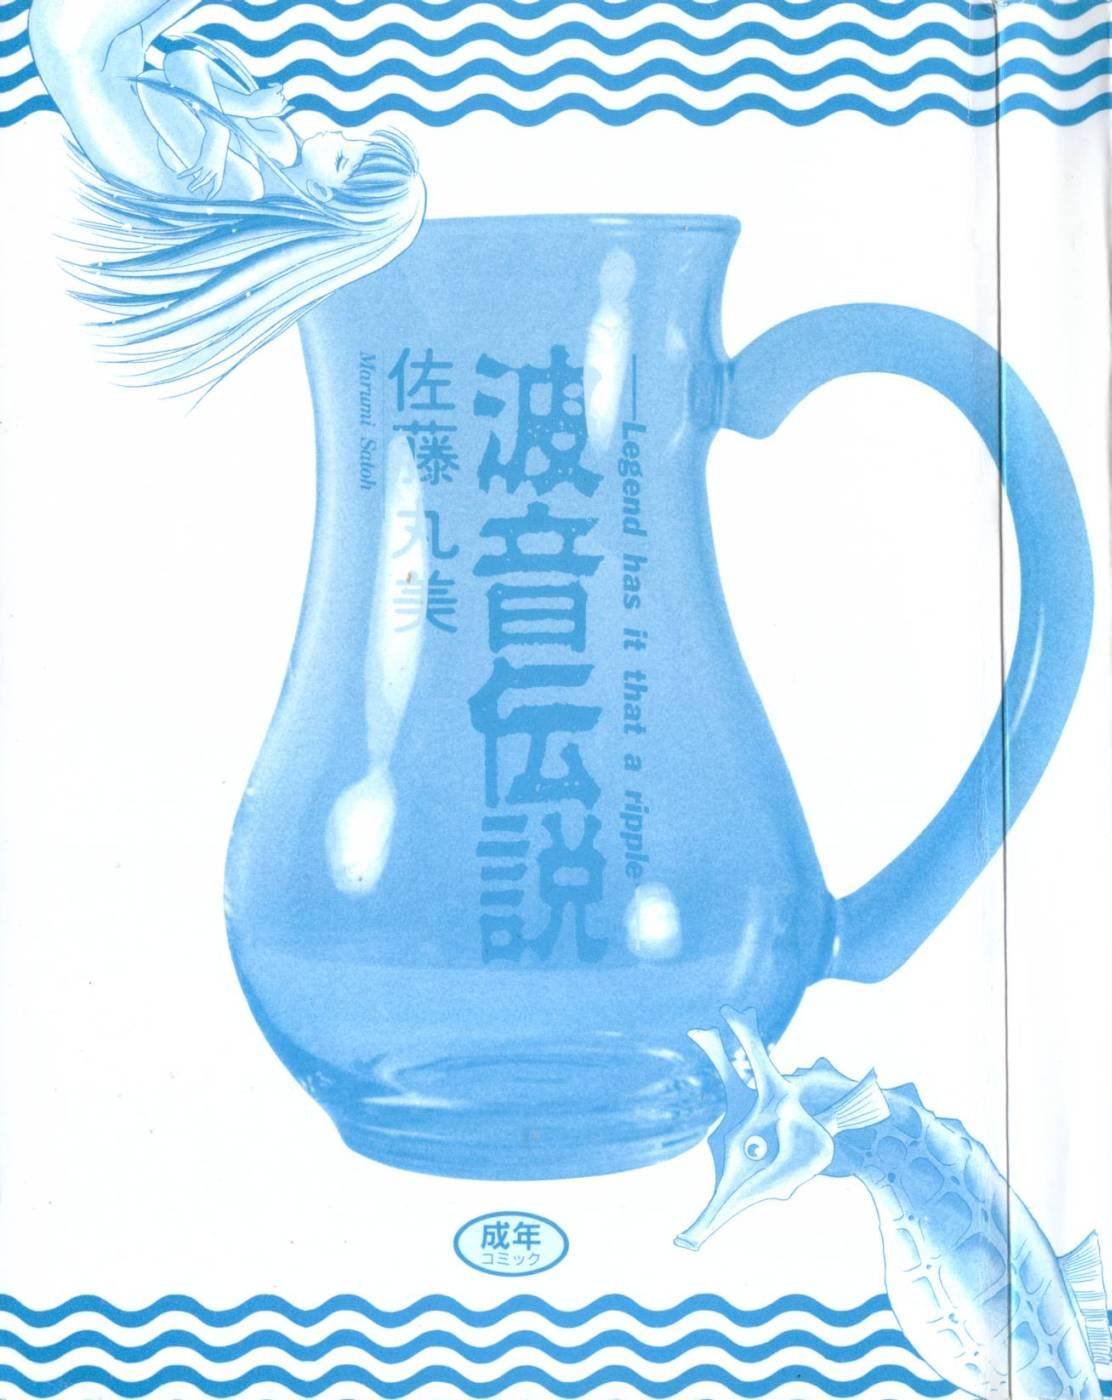 Namioto Densetsu 2